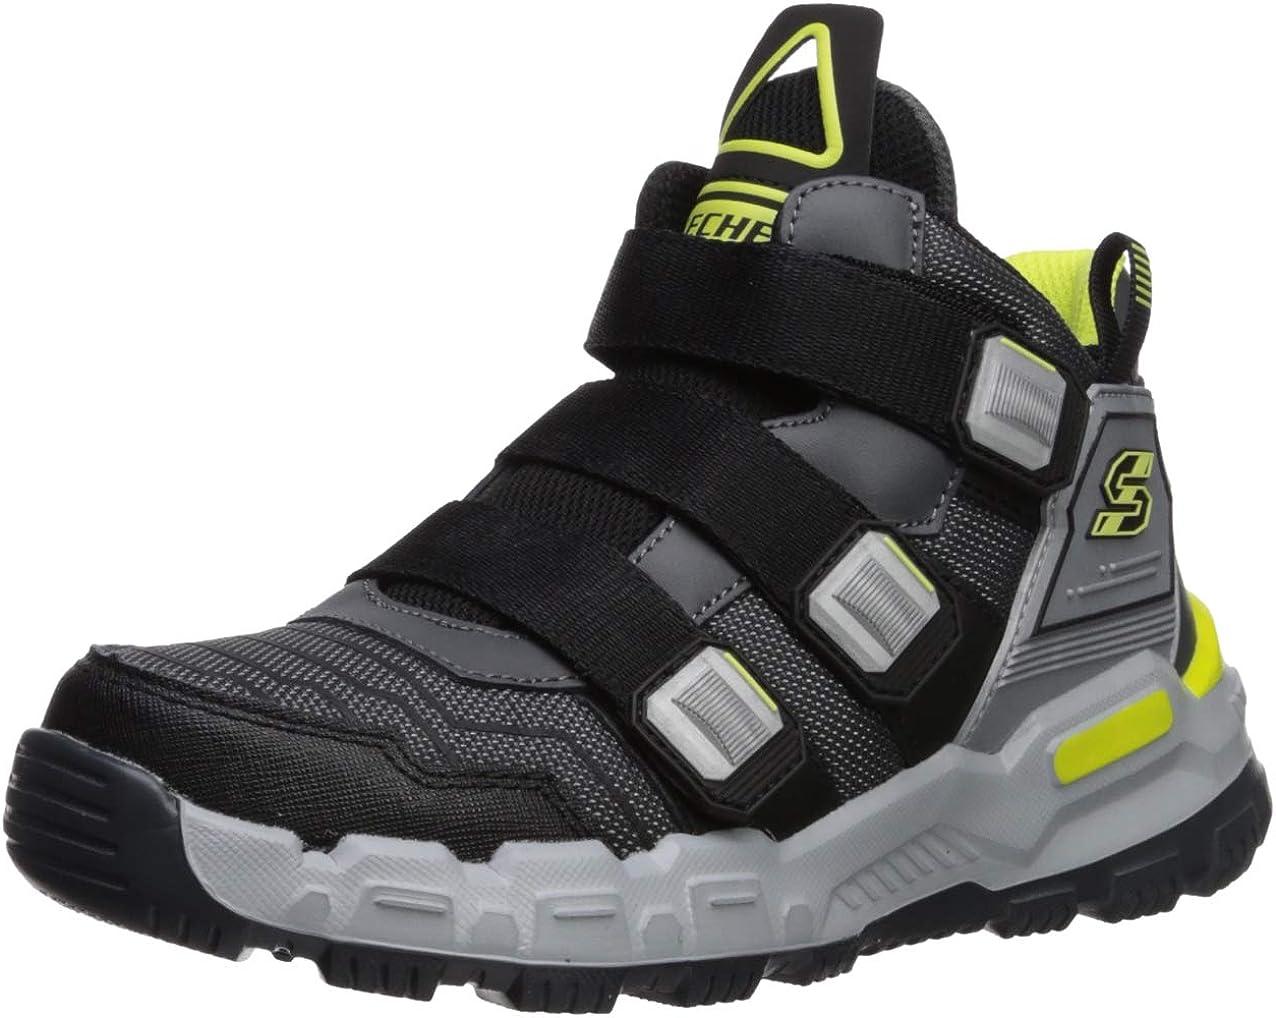 Skechers Unisex-Child Adventure Track